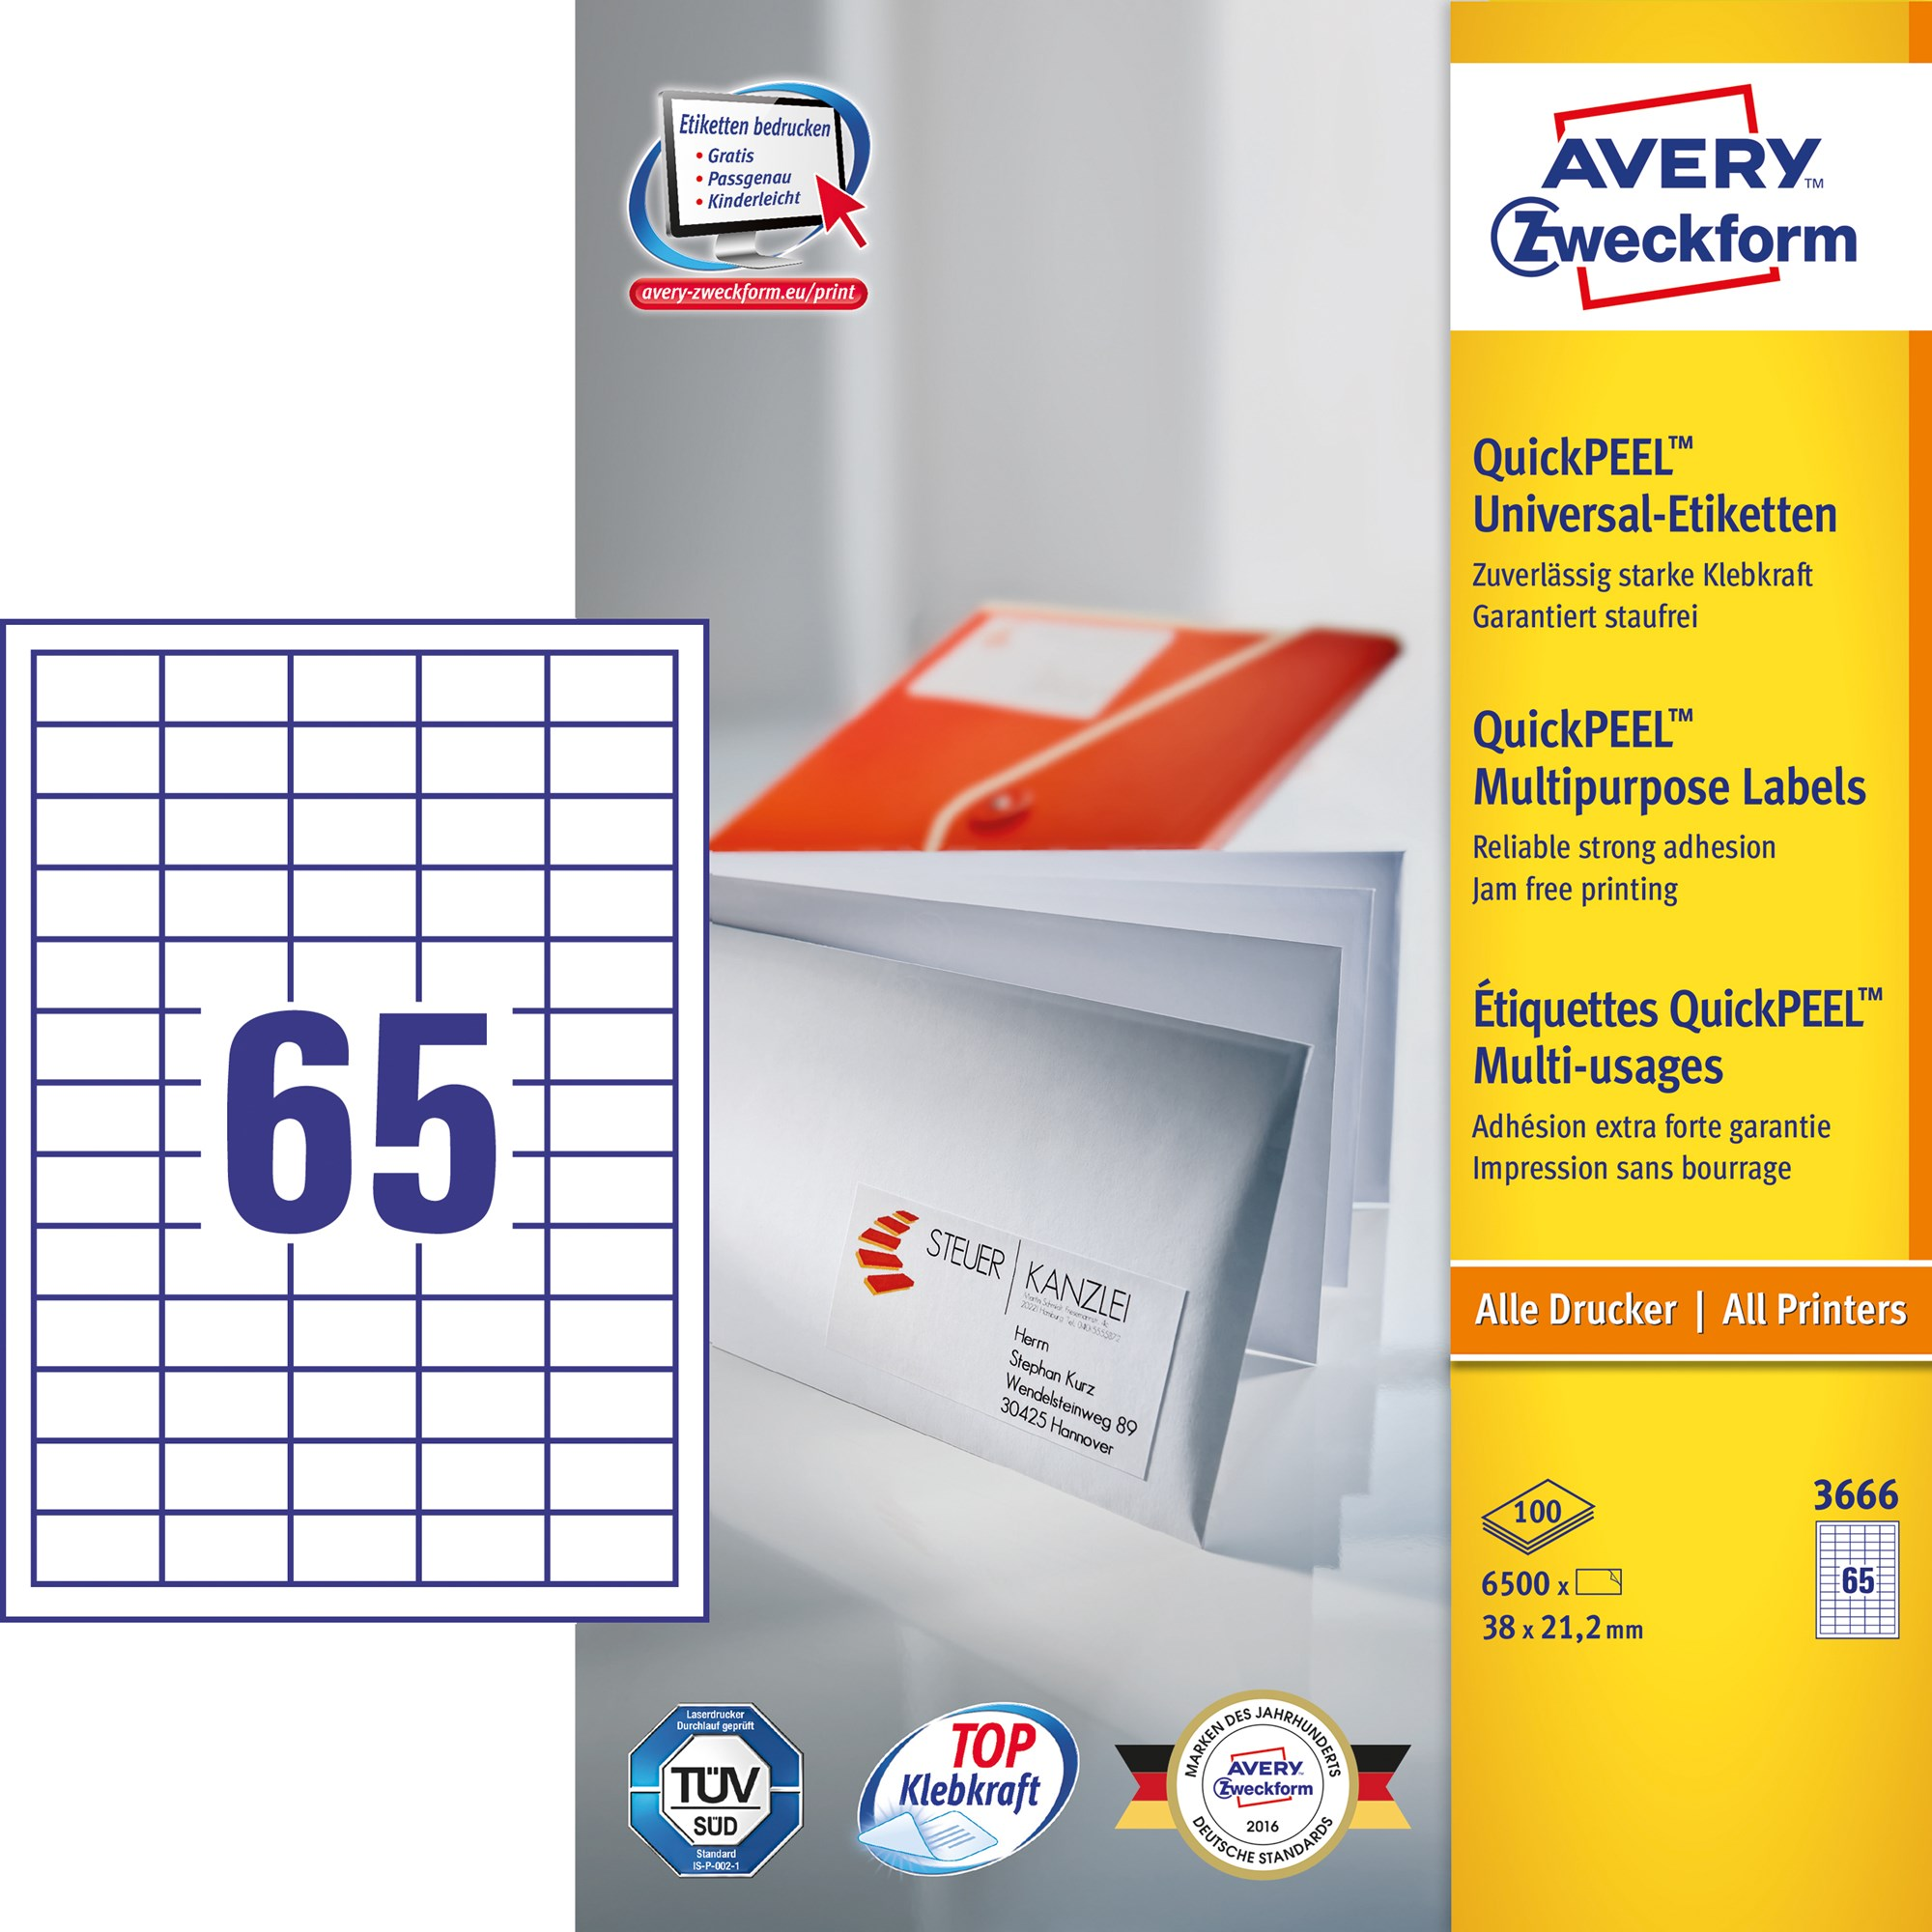 Image of Avery ILC universal etiket 38x21,2mm QP (6500)